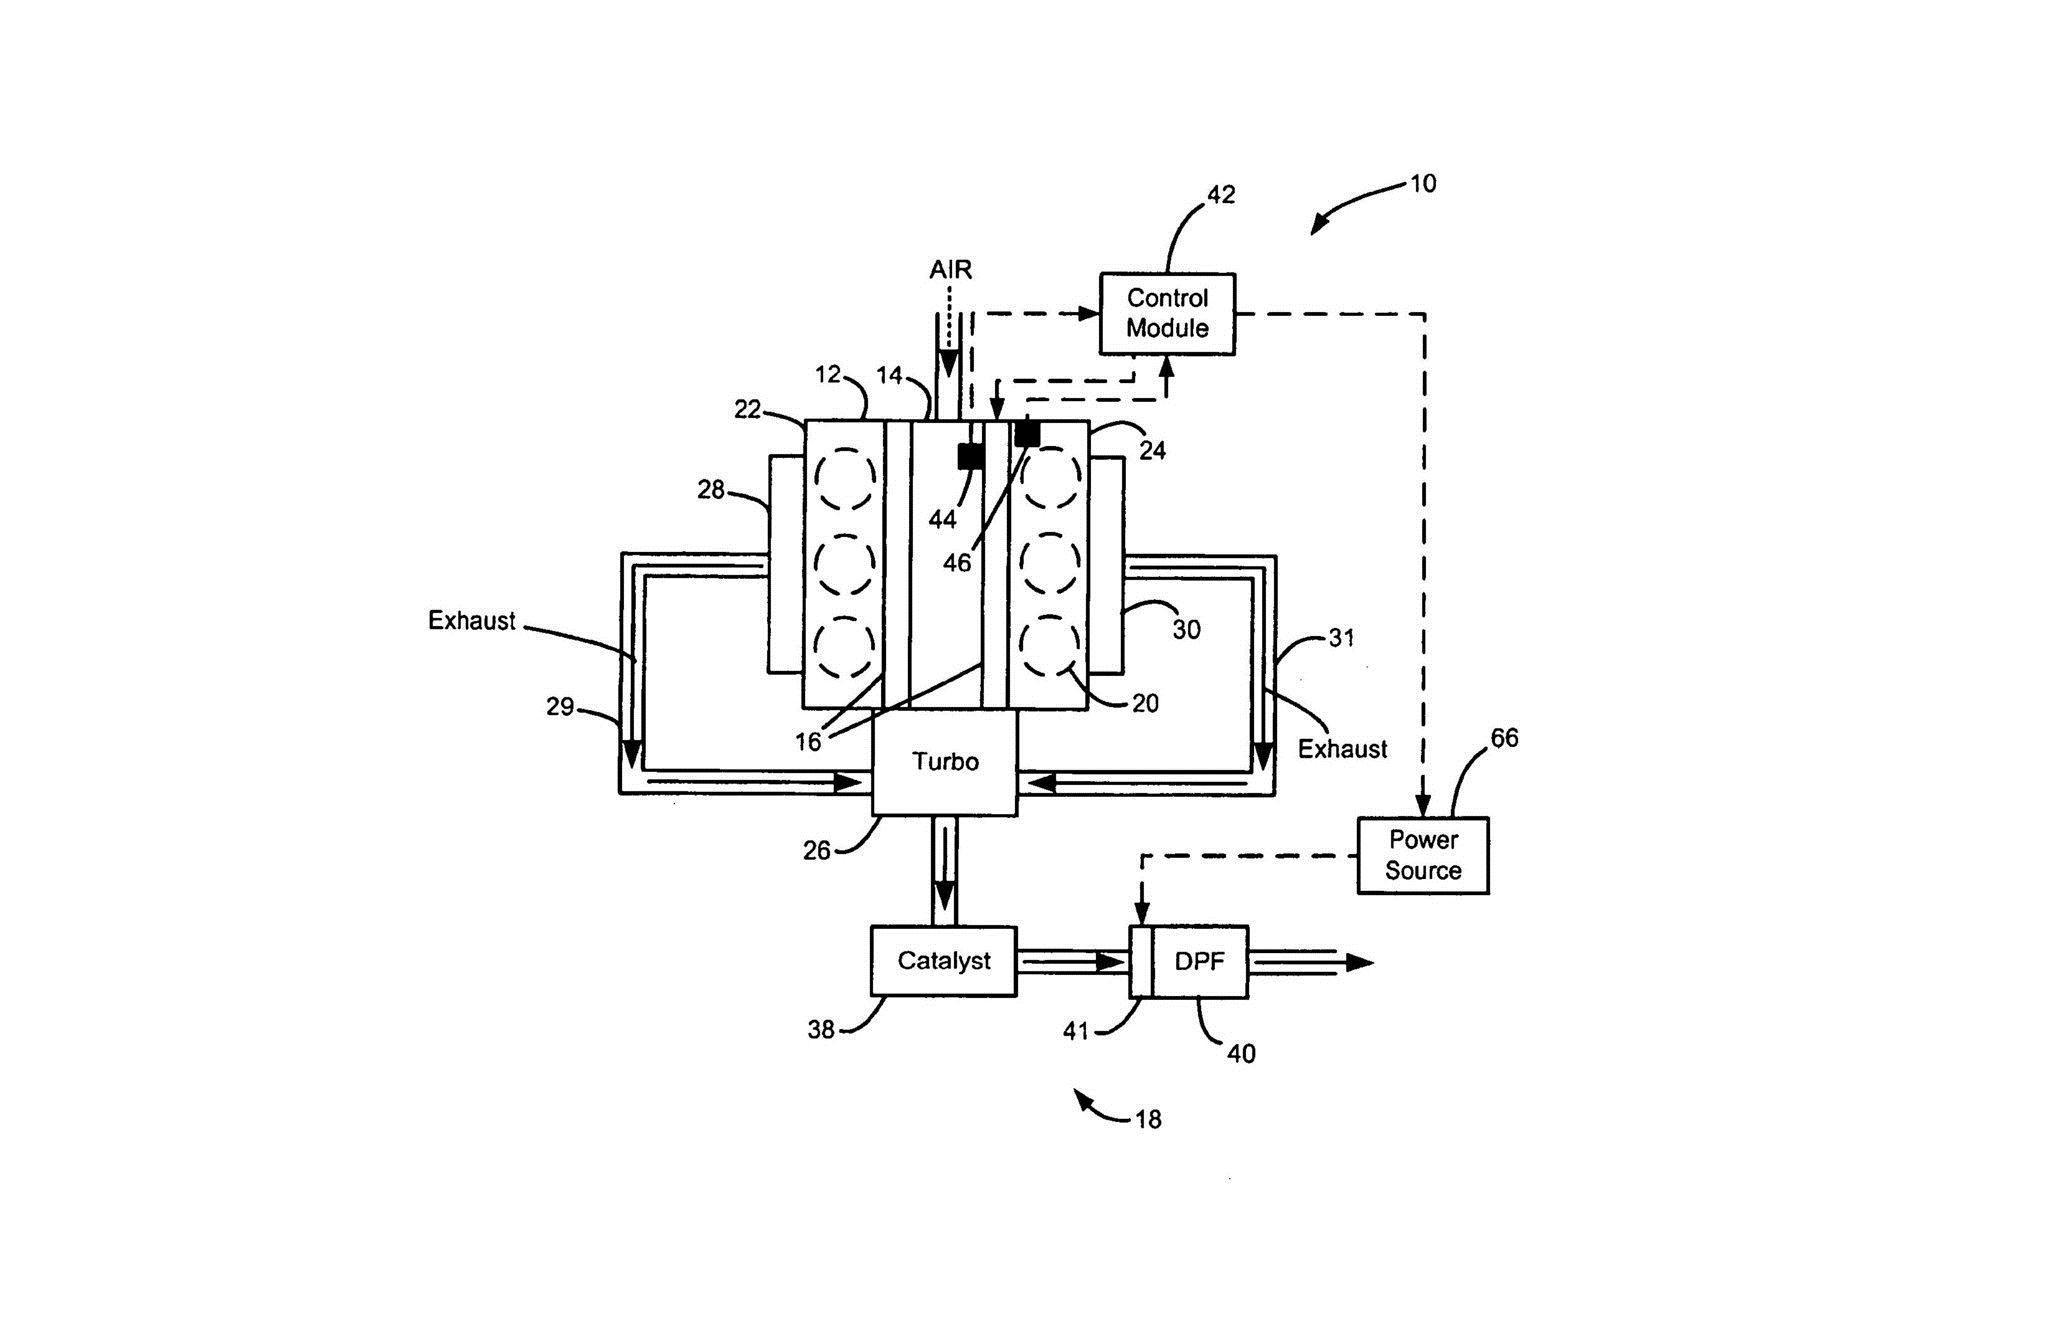 Patent Trolling: Next-Gen Diesel Particulate Filter